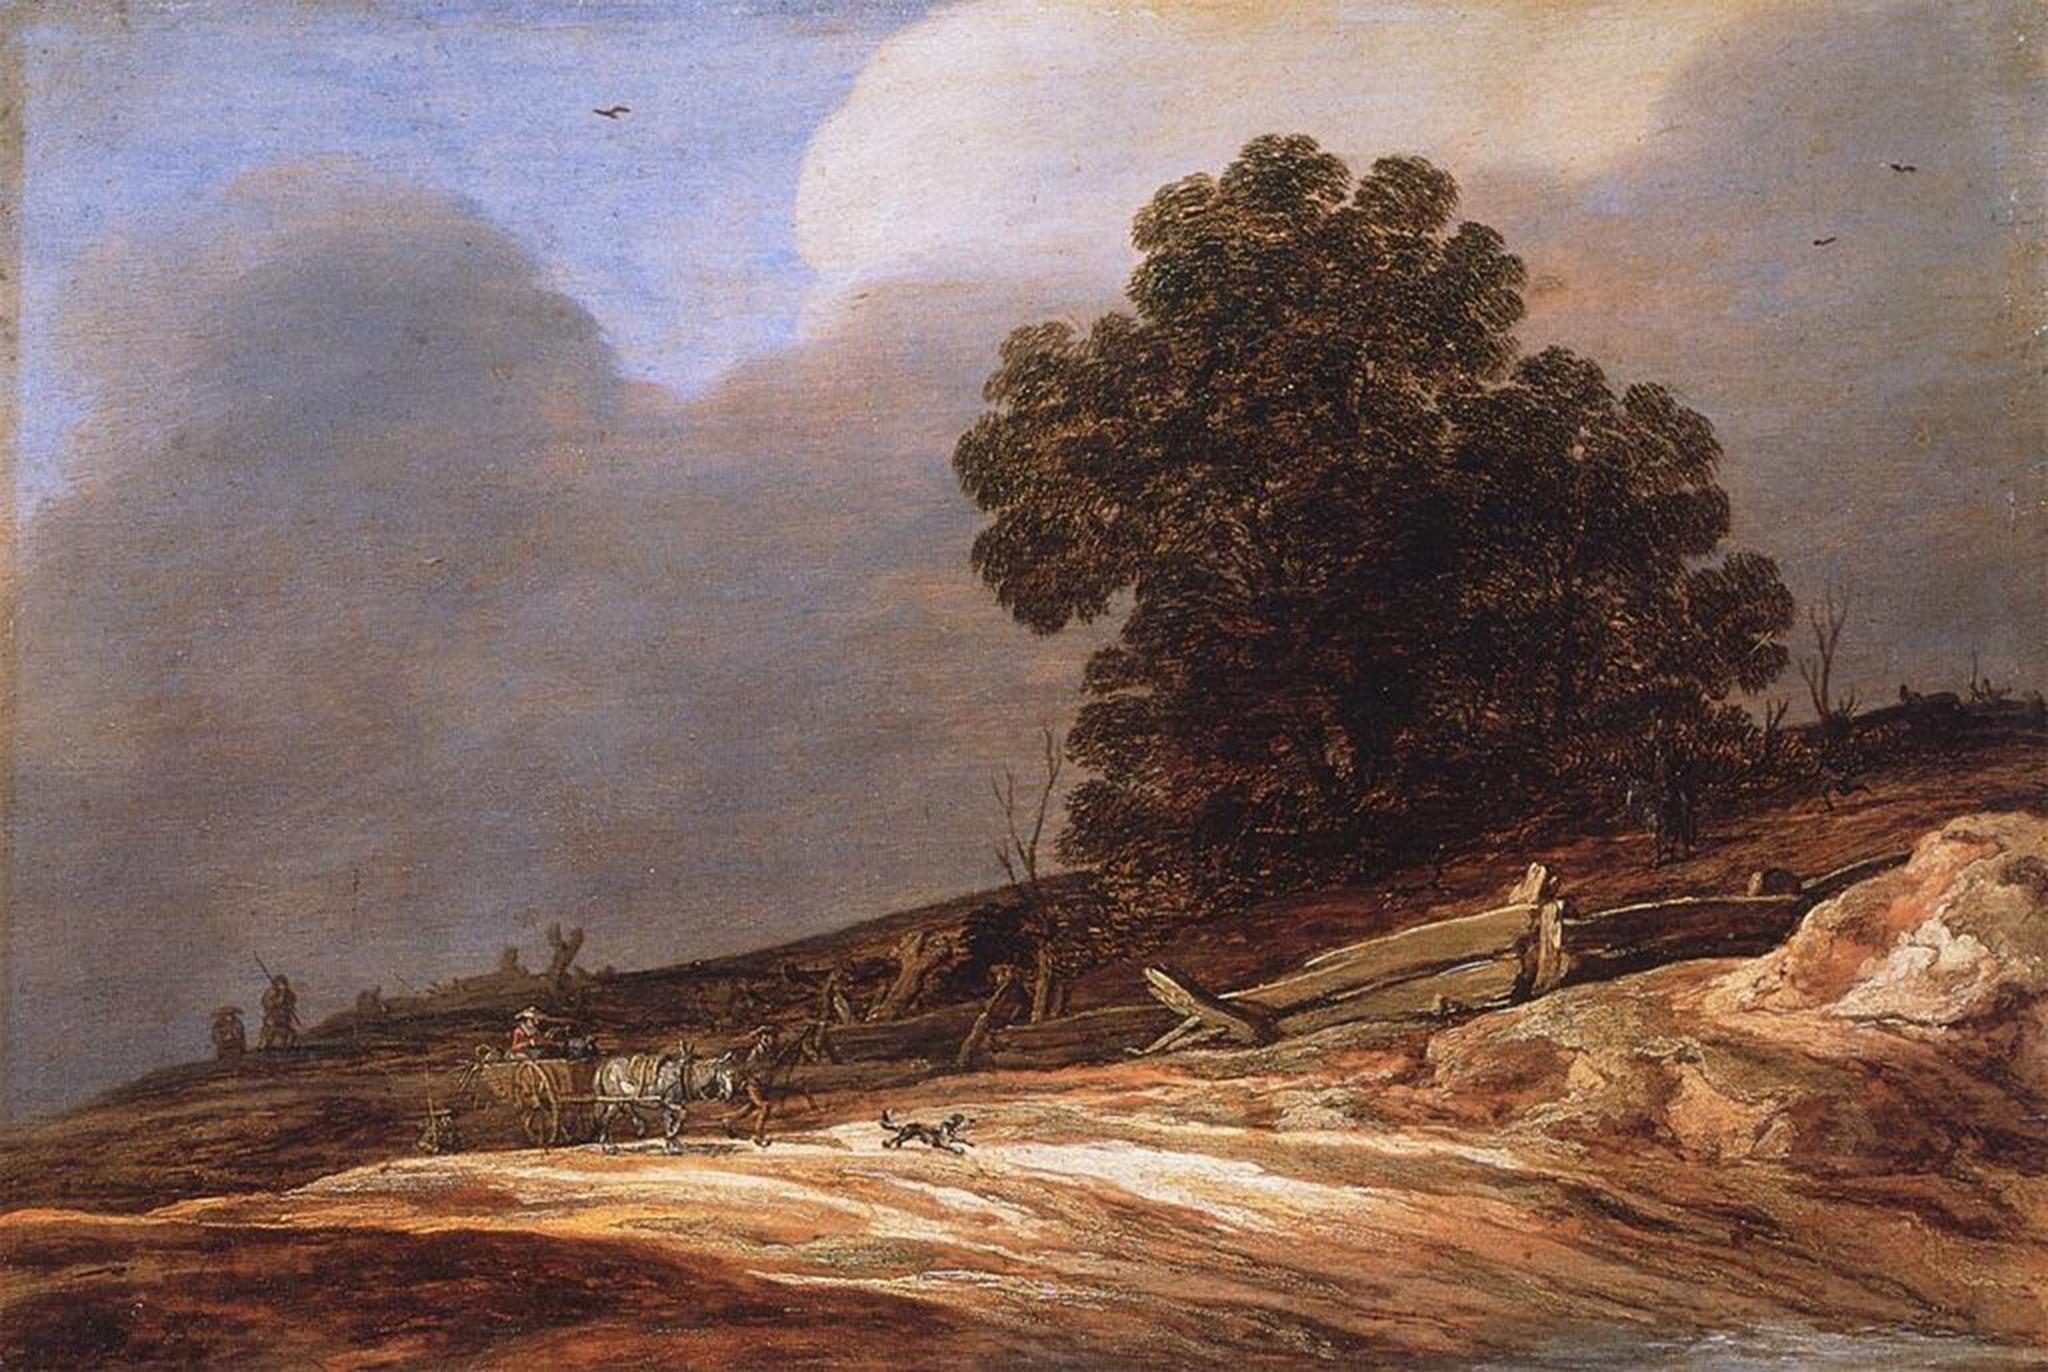 Pieter De Molijn, Landscape With Dunes And A Sandy Road, 1626, Braunschweig,